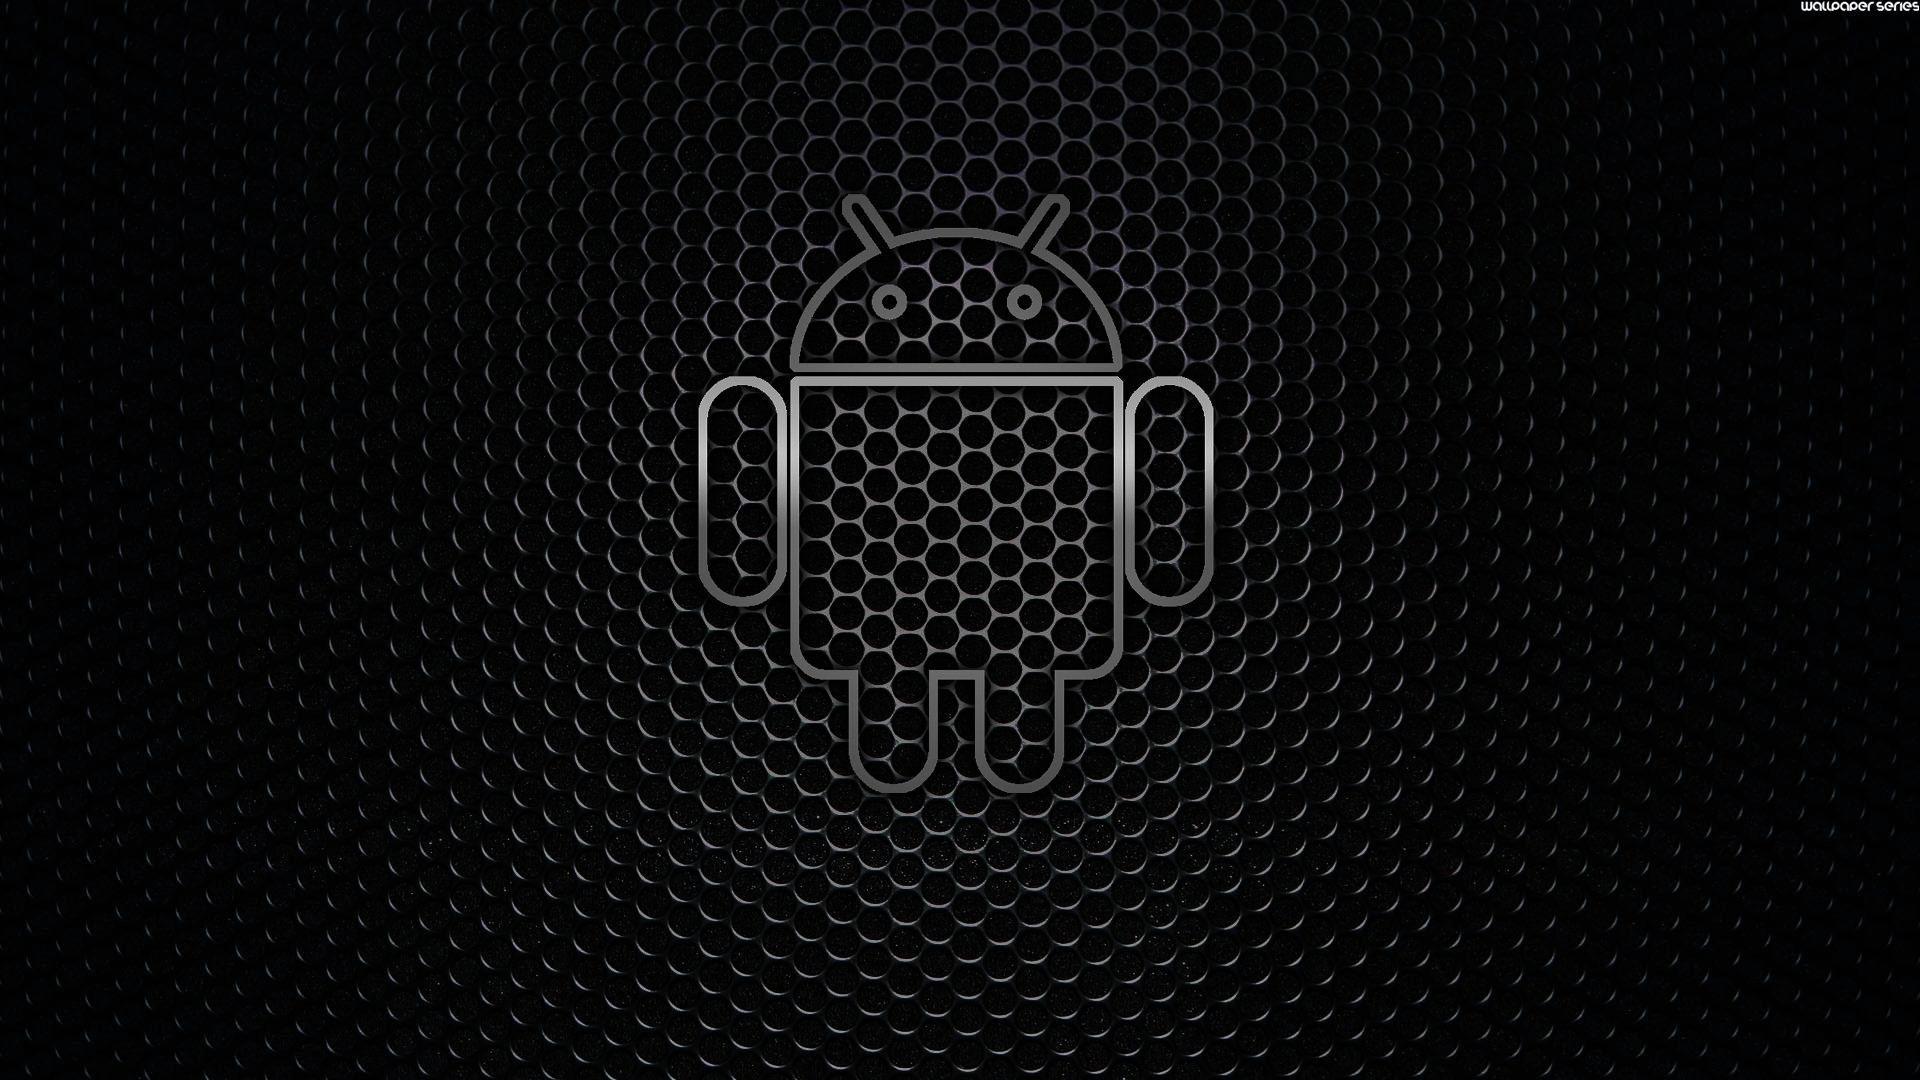 картинка на заставку на андроид